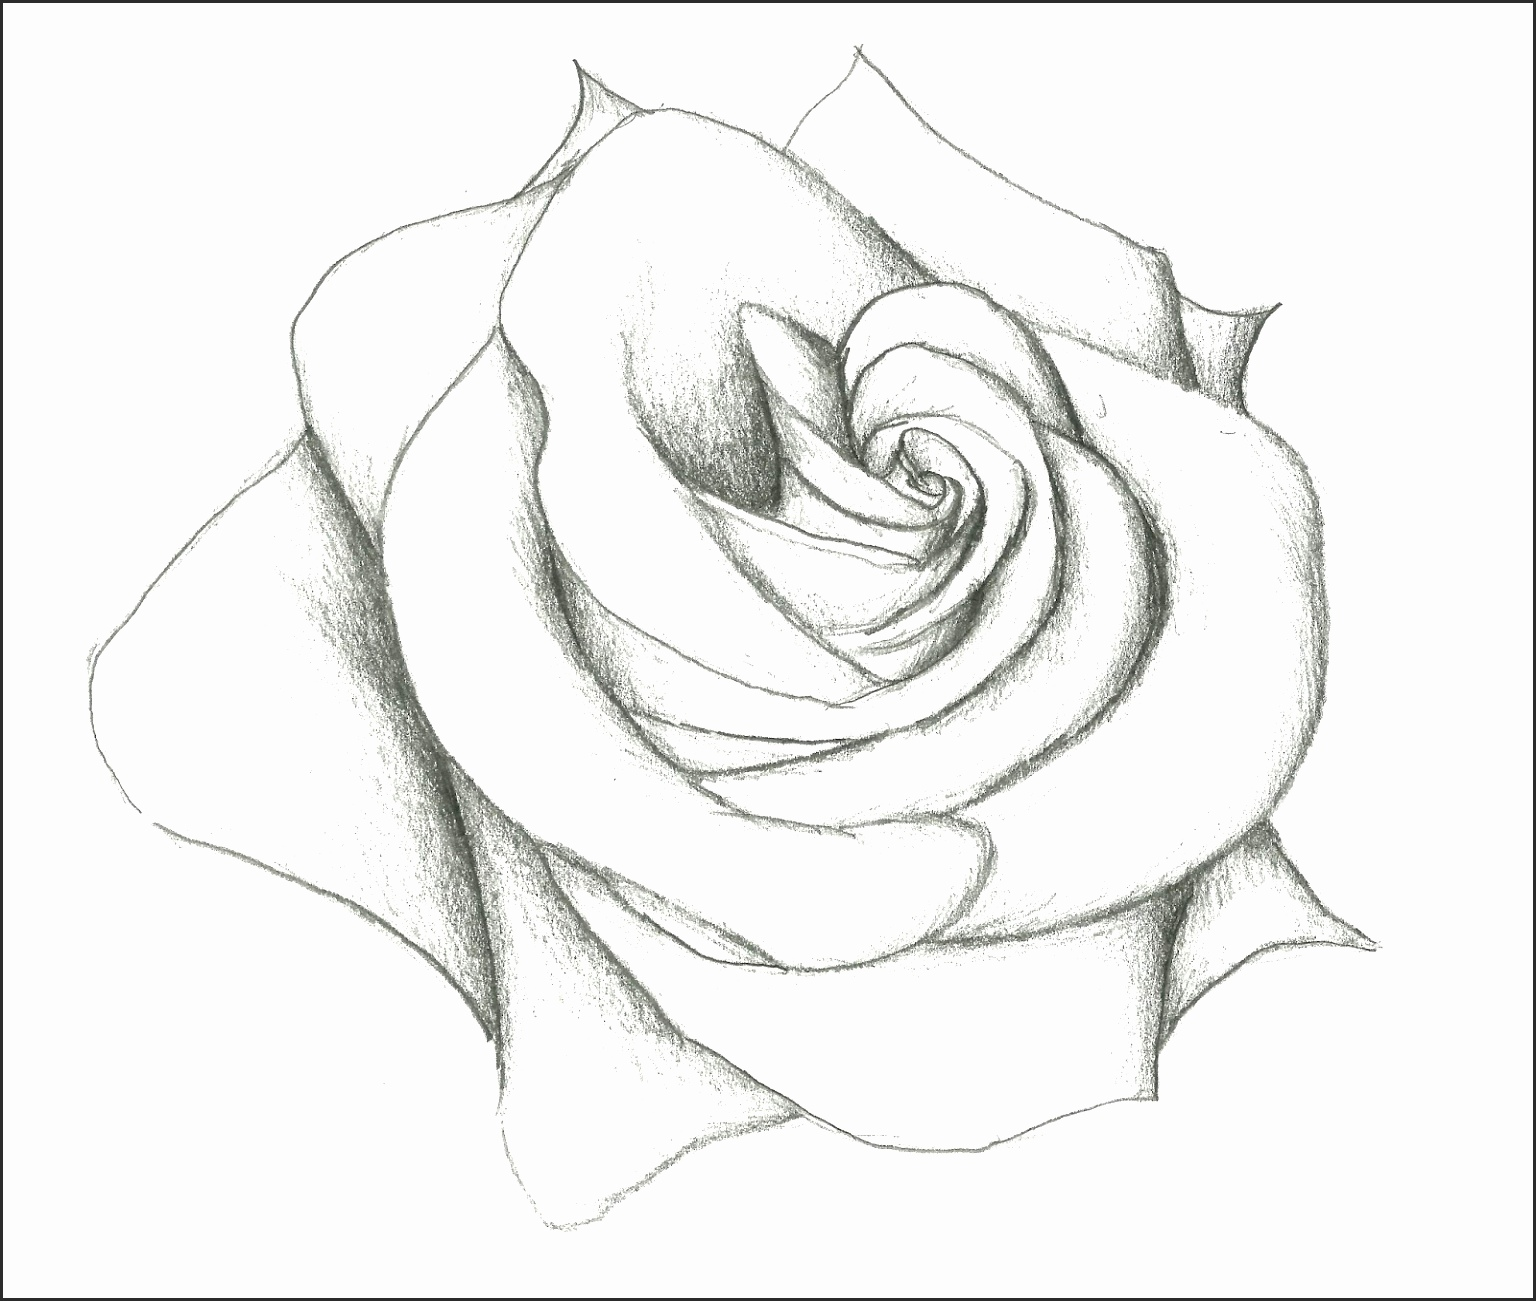 1536x1301 How To Draw Pretty Flowers Sjxse Best Of Beautiful Flowers Amp Easy